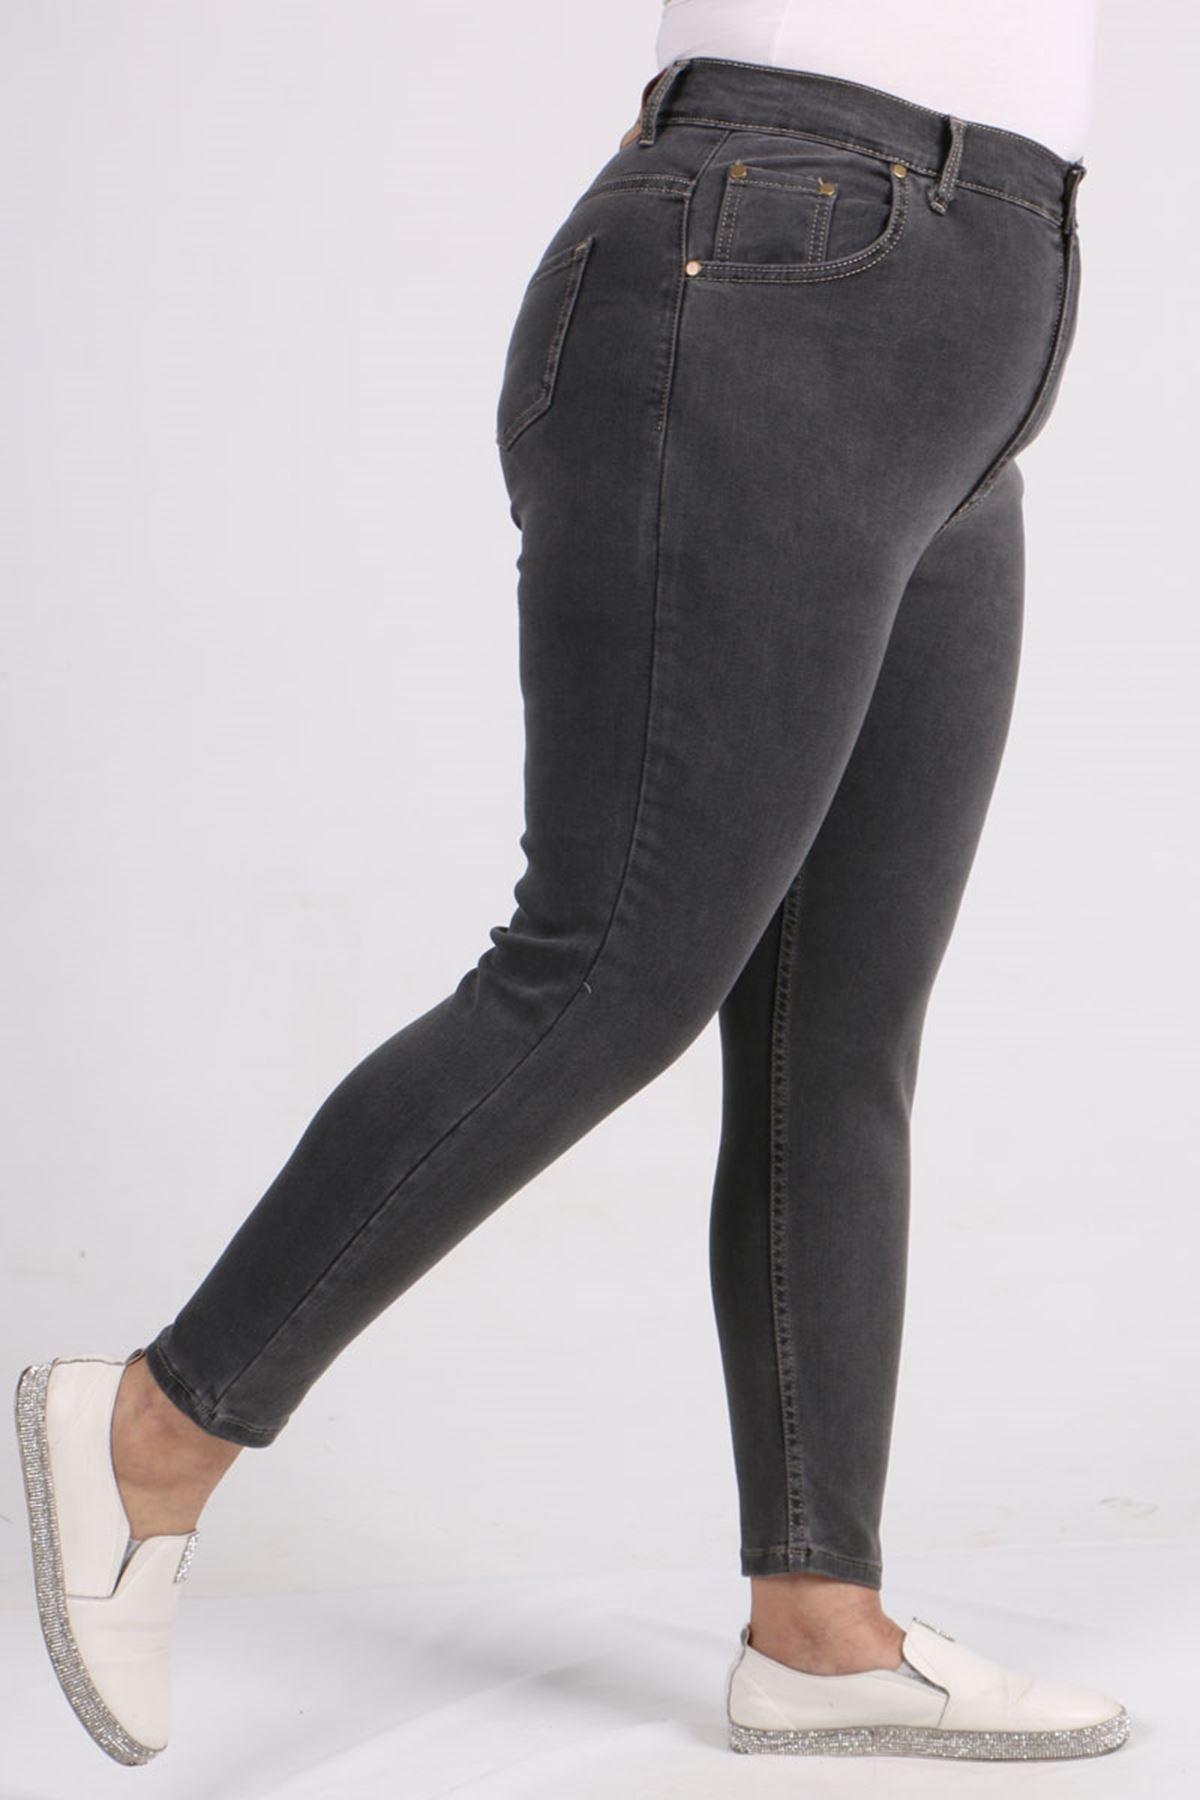 9107-1 Plus Size Skinny Leg Jeans - Anthracite